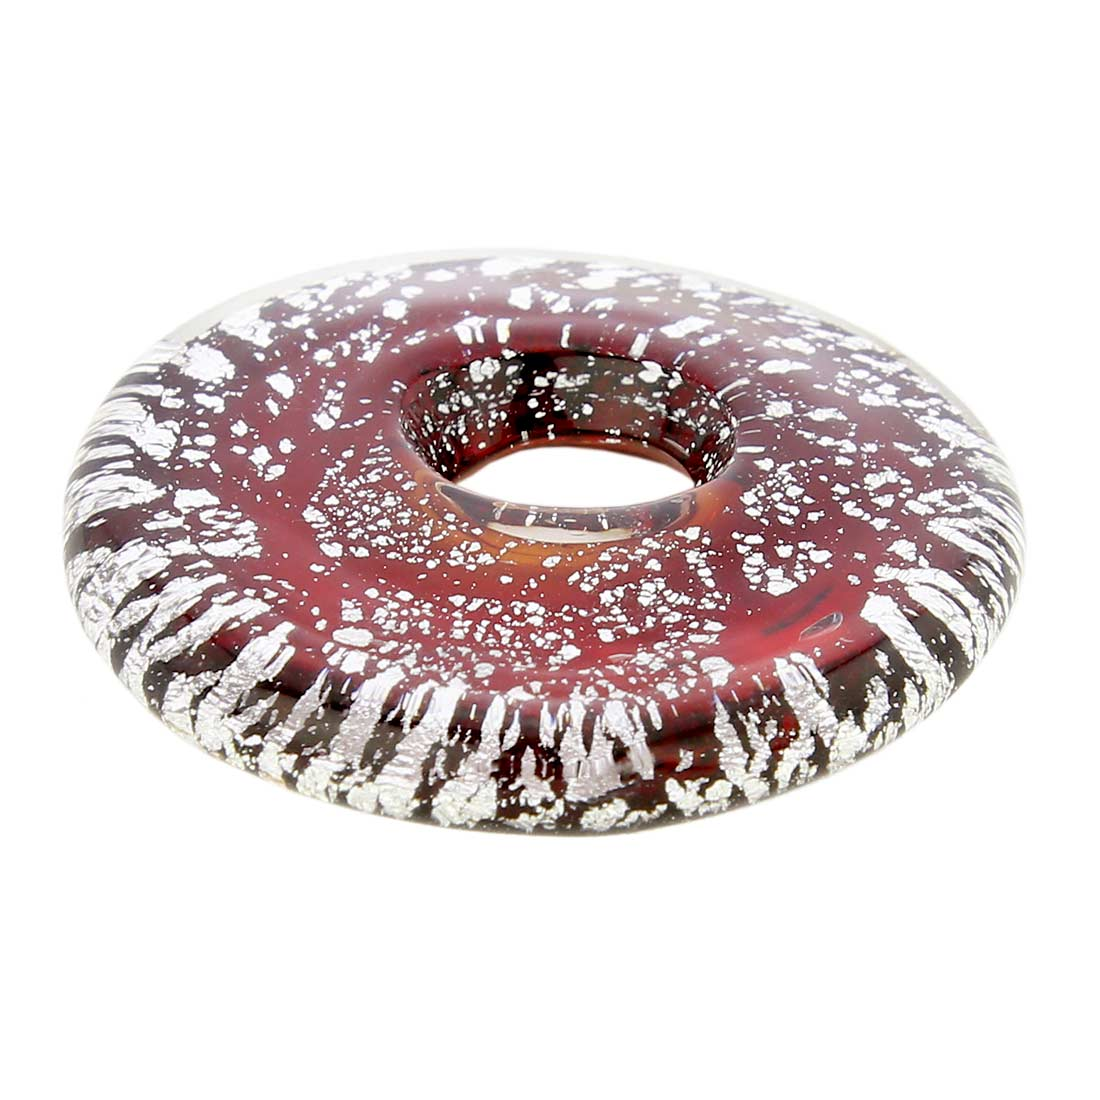 Silver Rain bagel pendant - Red